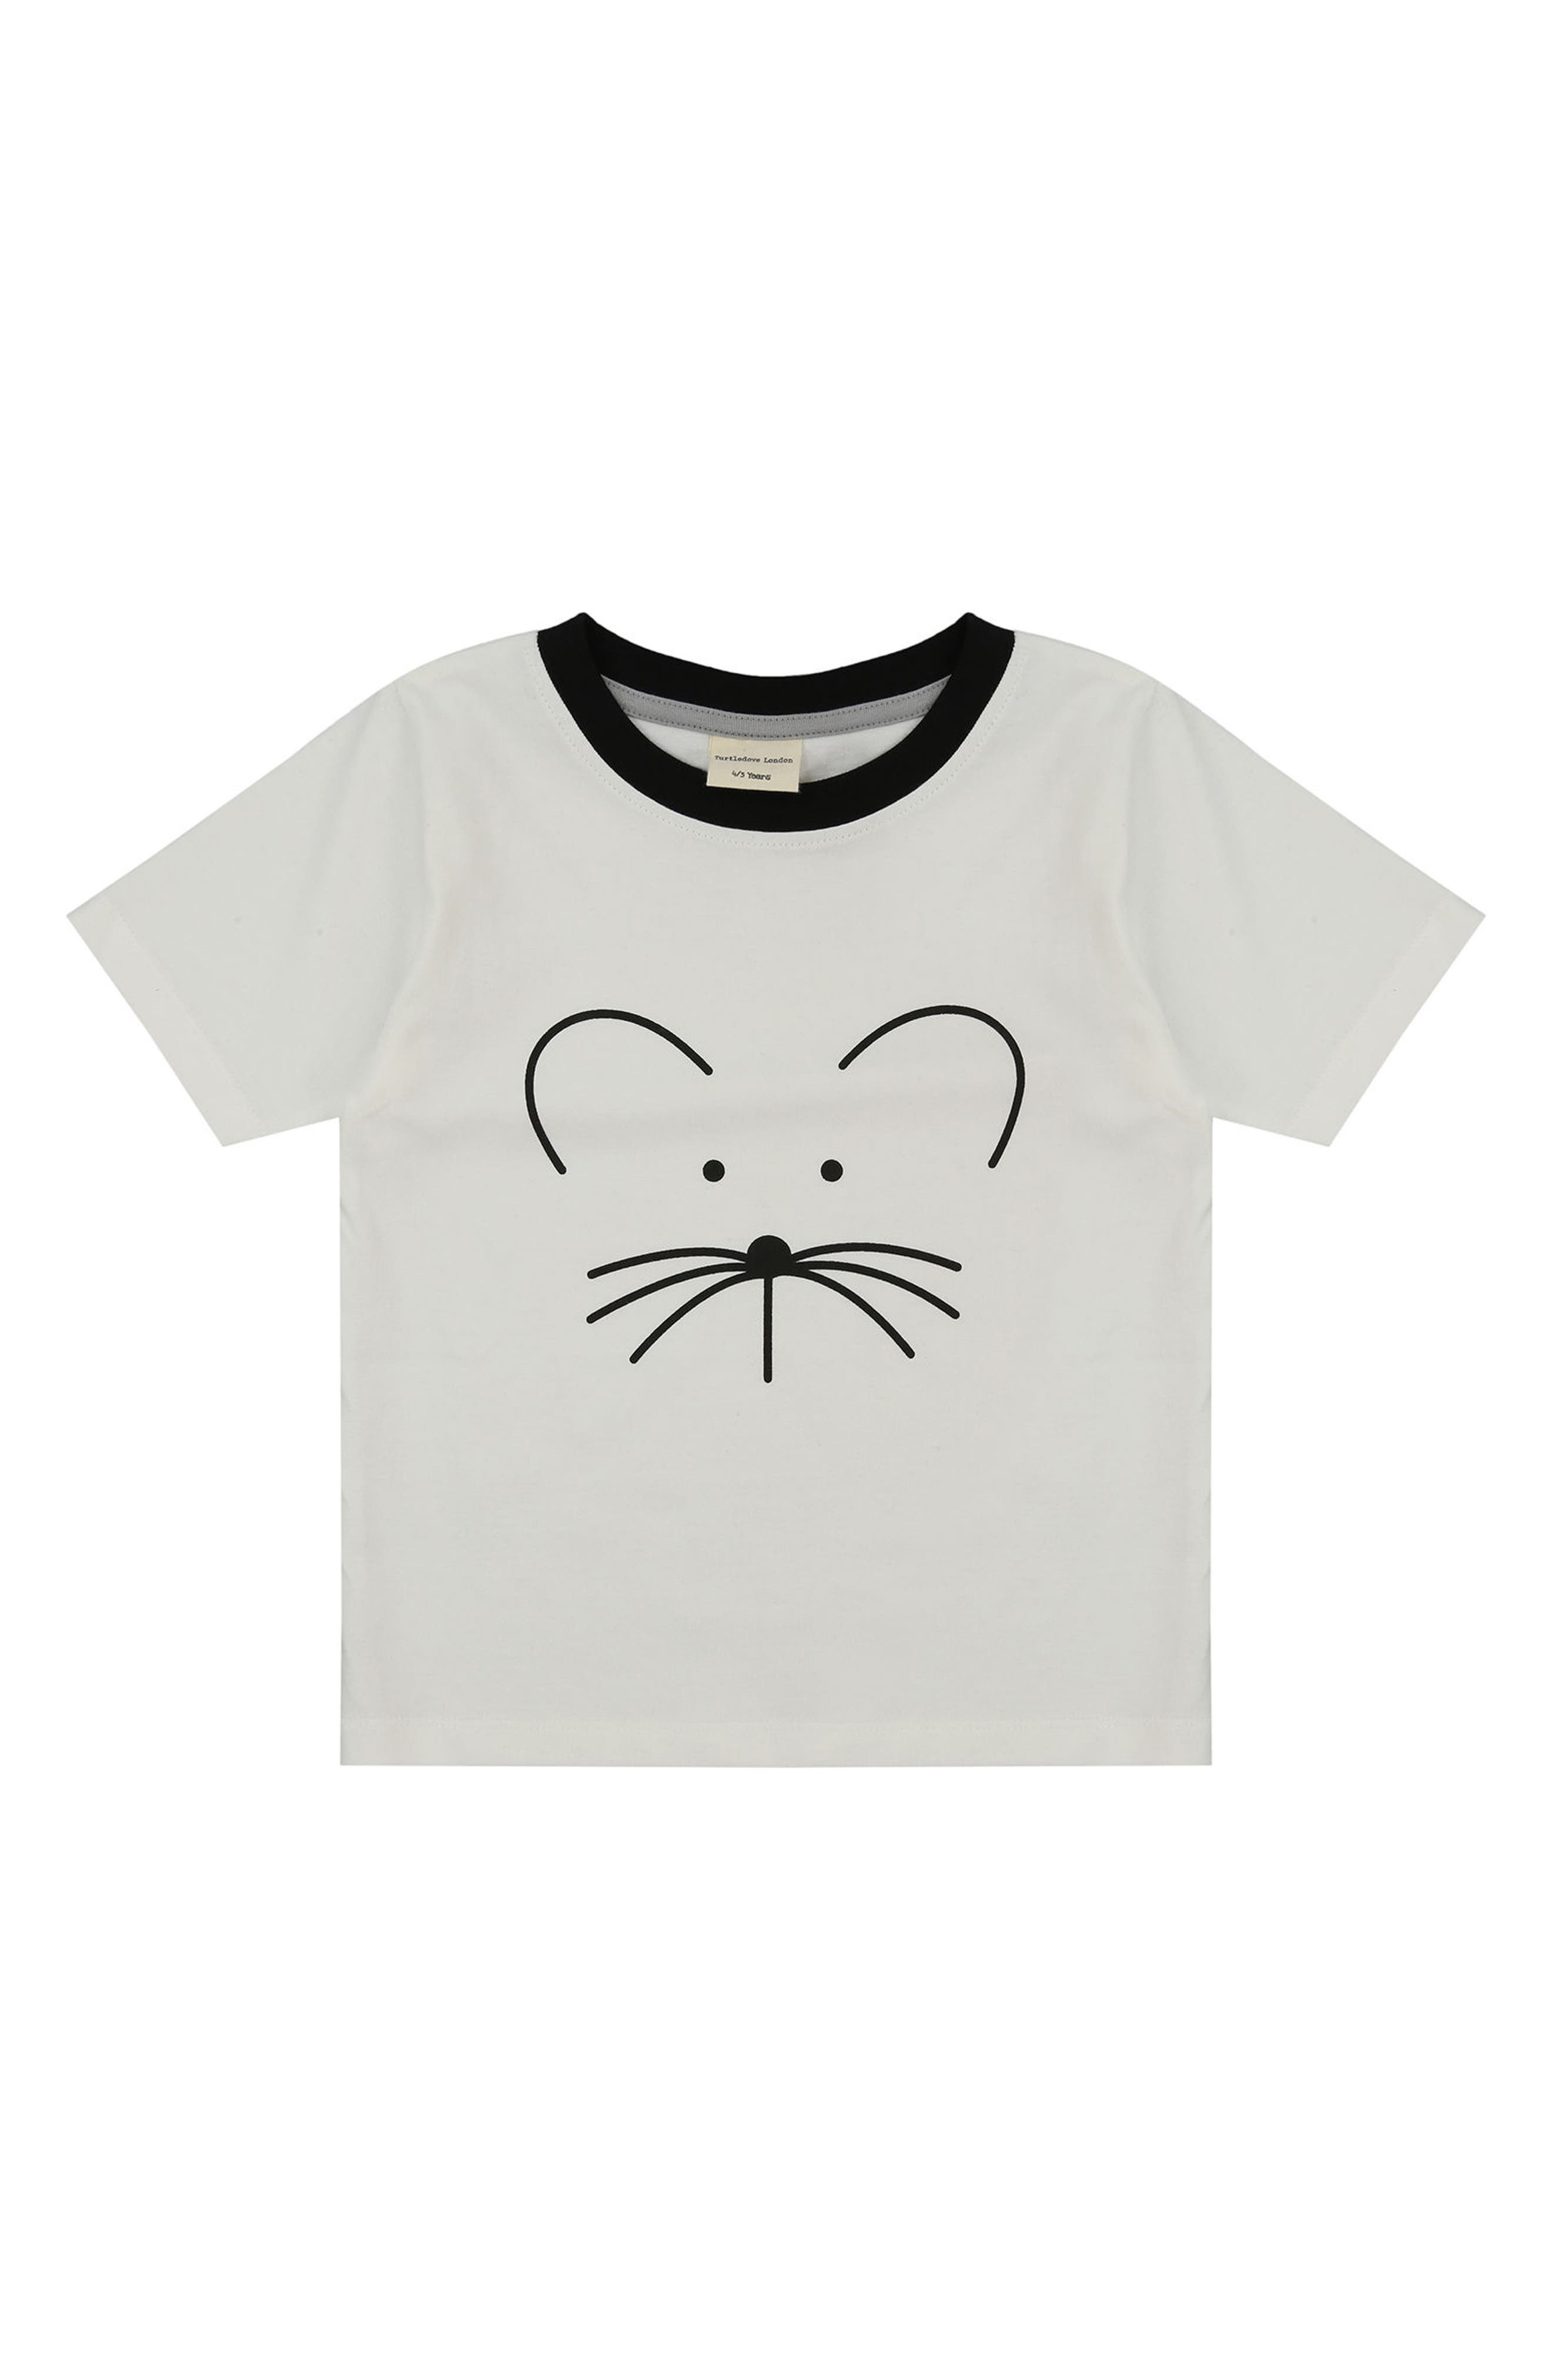 Goodbye Mousey Organic Cotton T-Shirt,                             Main thumbnail 1, color,                             100